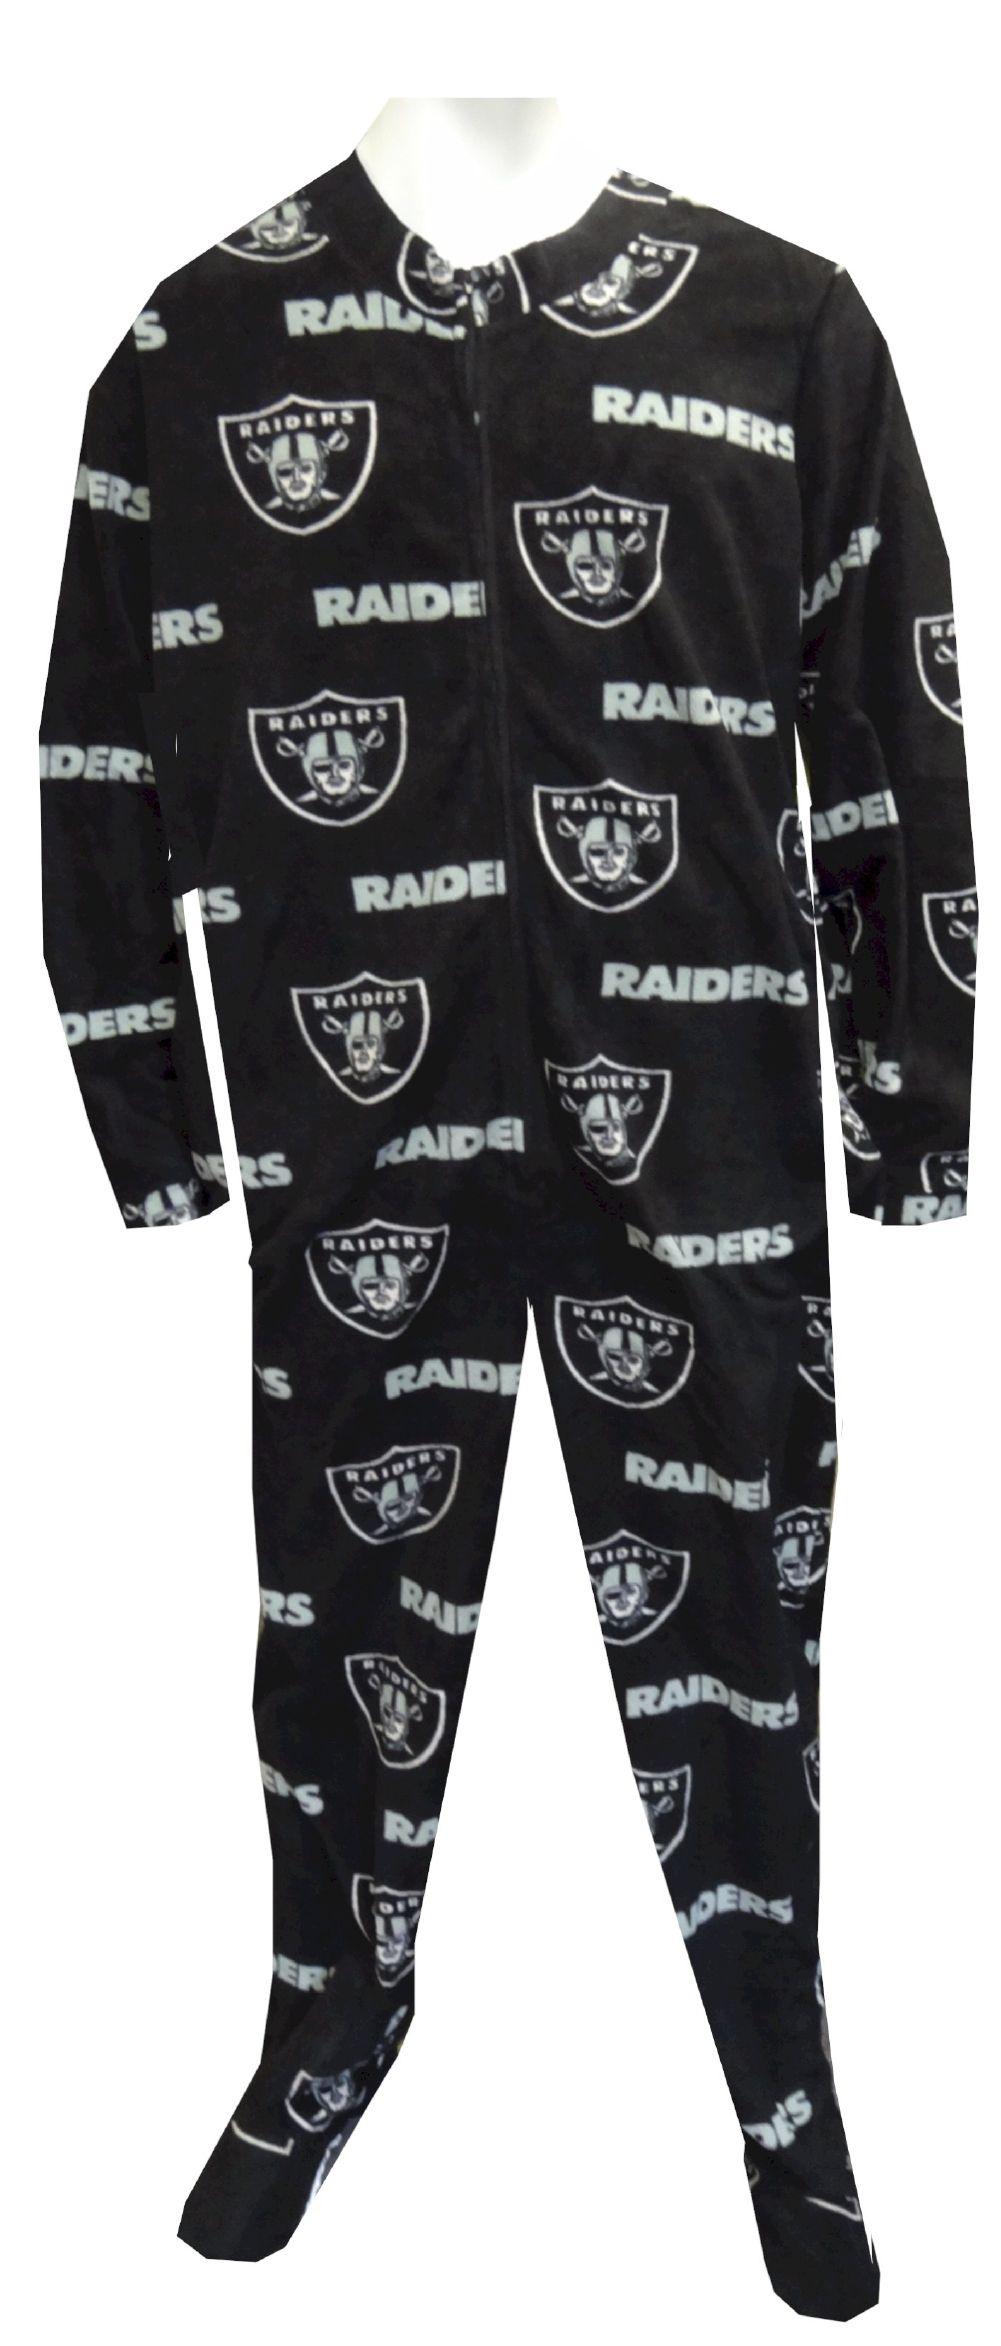 7ac91440 Oakland Raiders Logo Guys Onesie Footie Pajama Show your team spirit ...